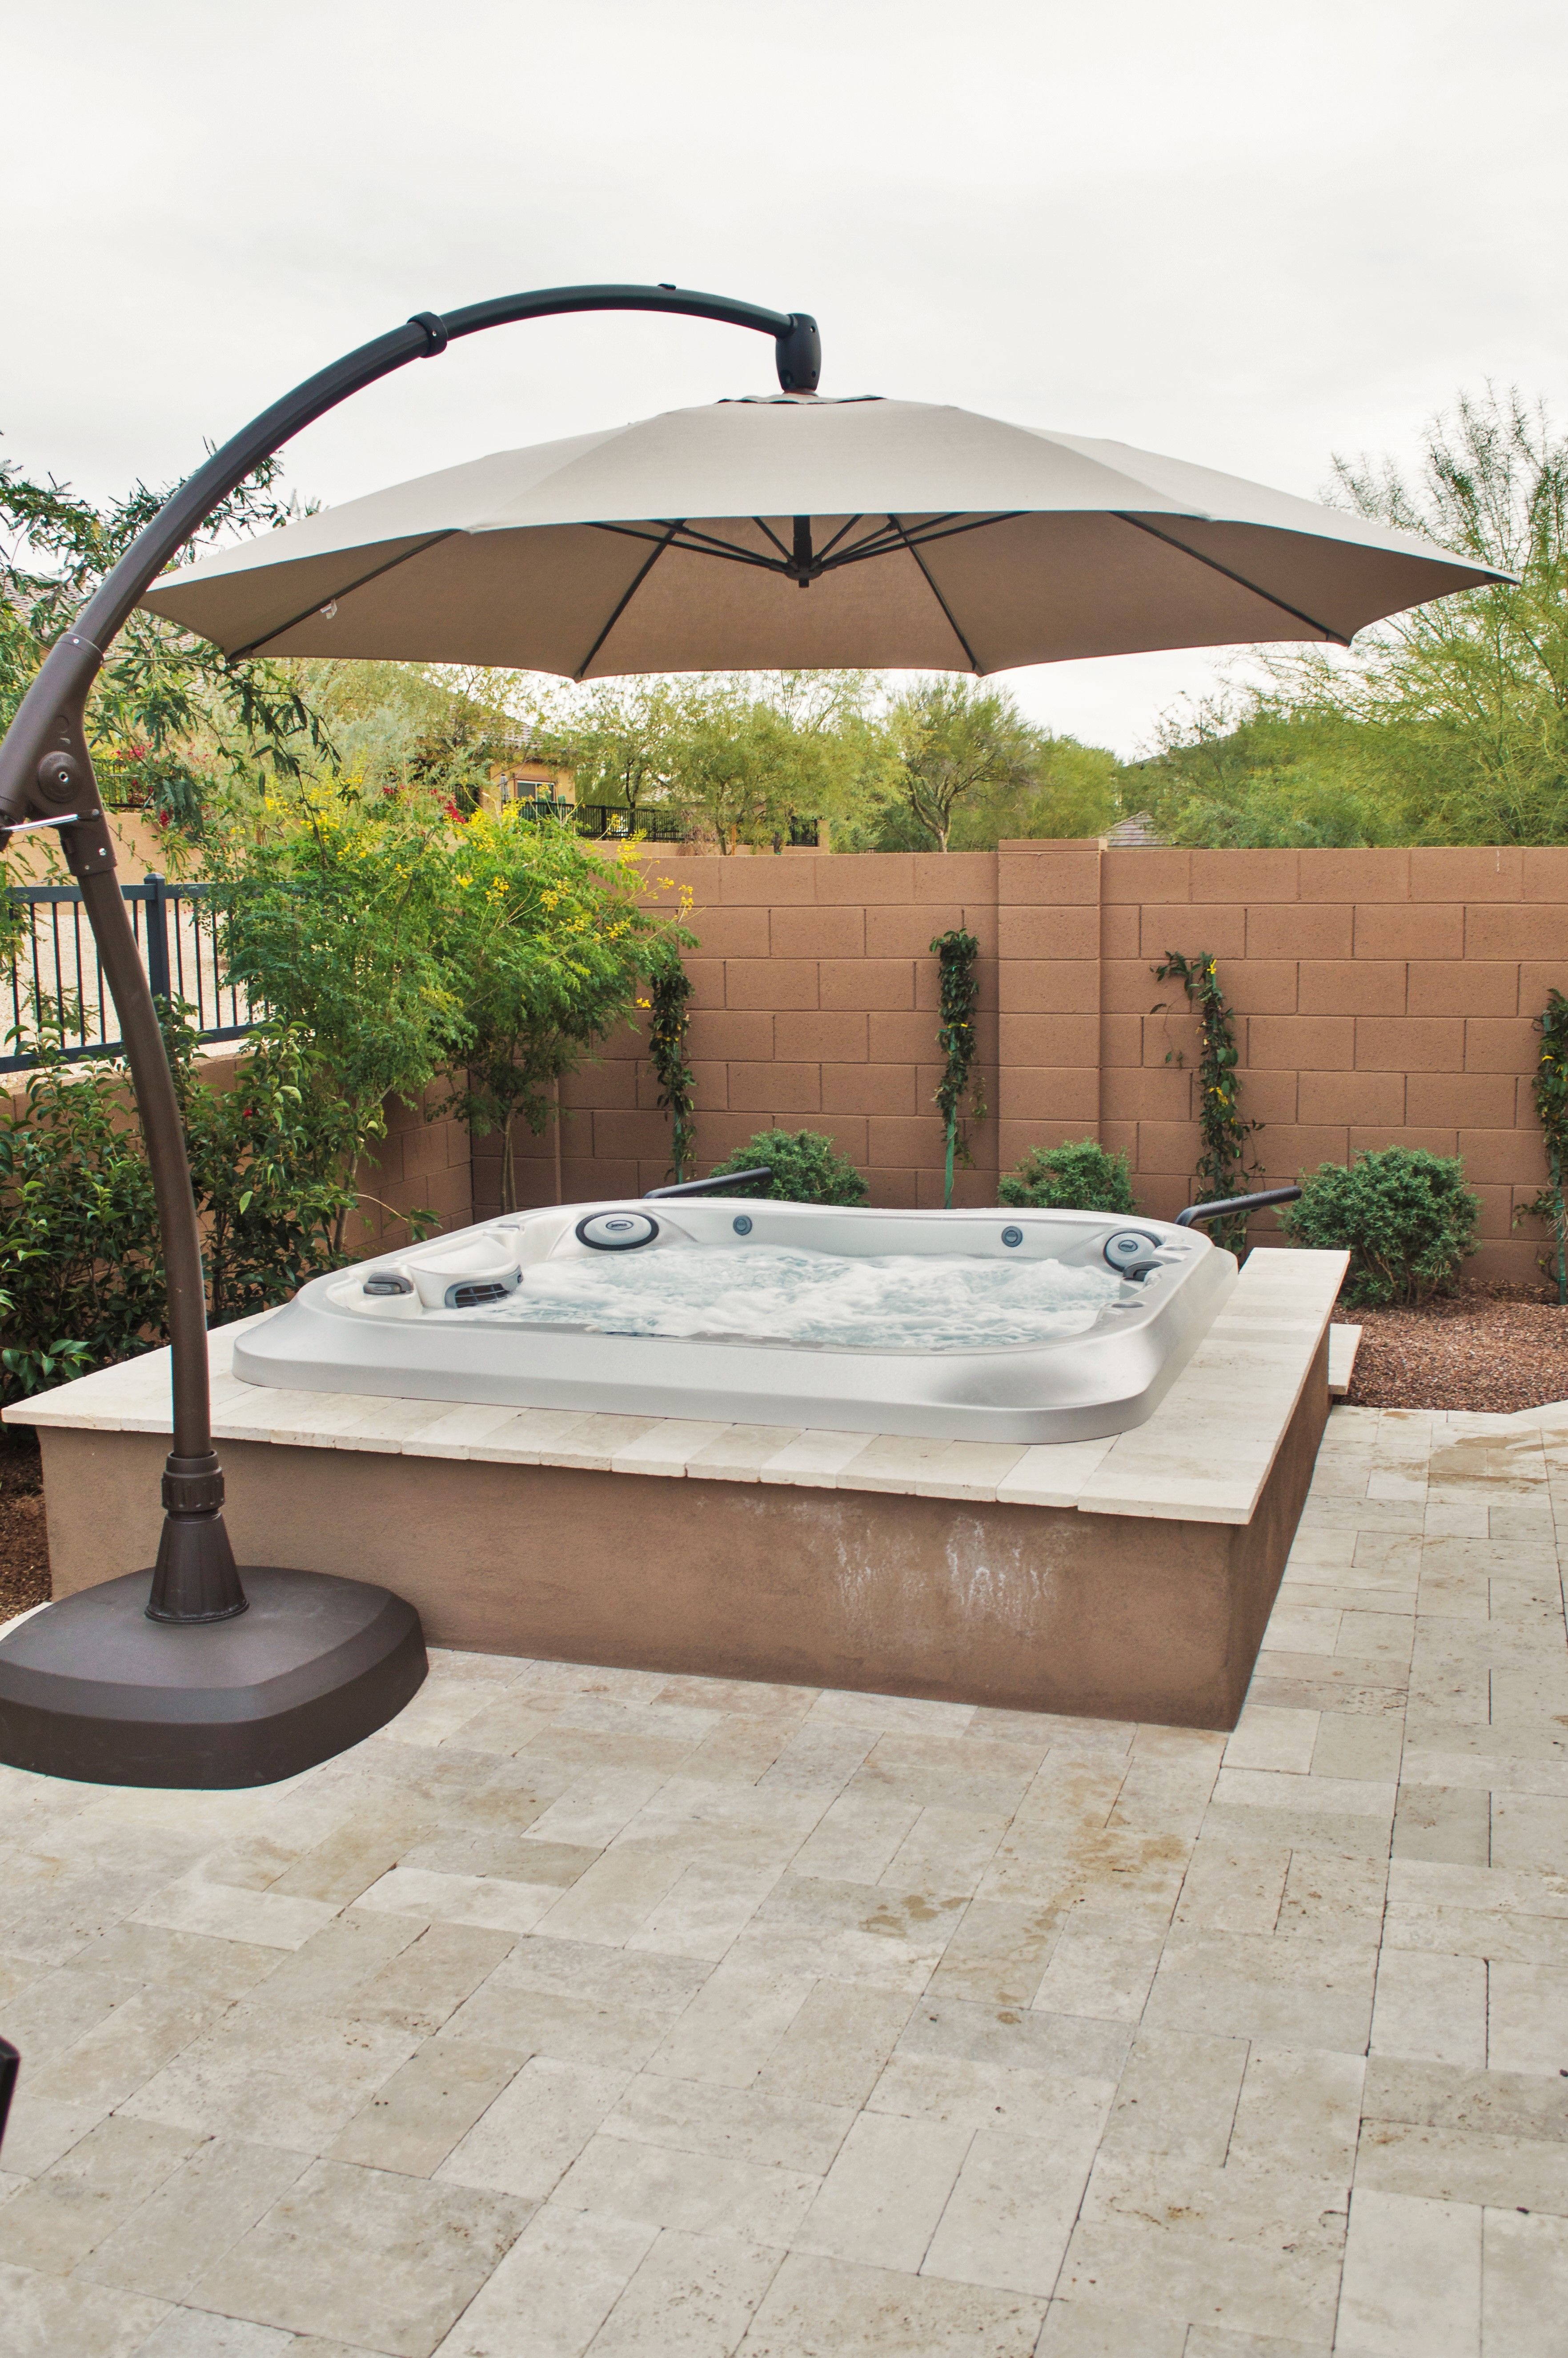 Imagine Backyard Living Has Established An Exclusive Partnership